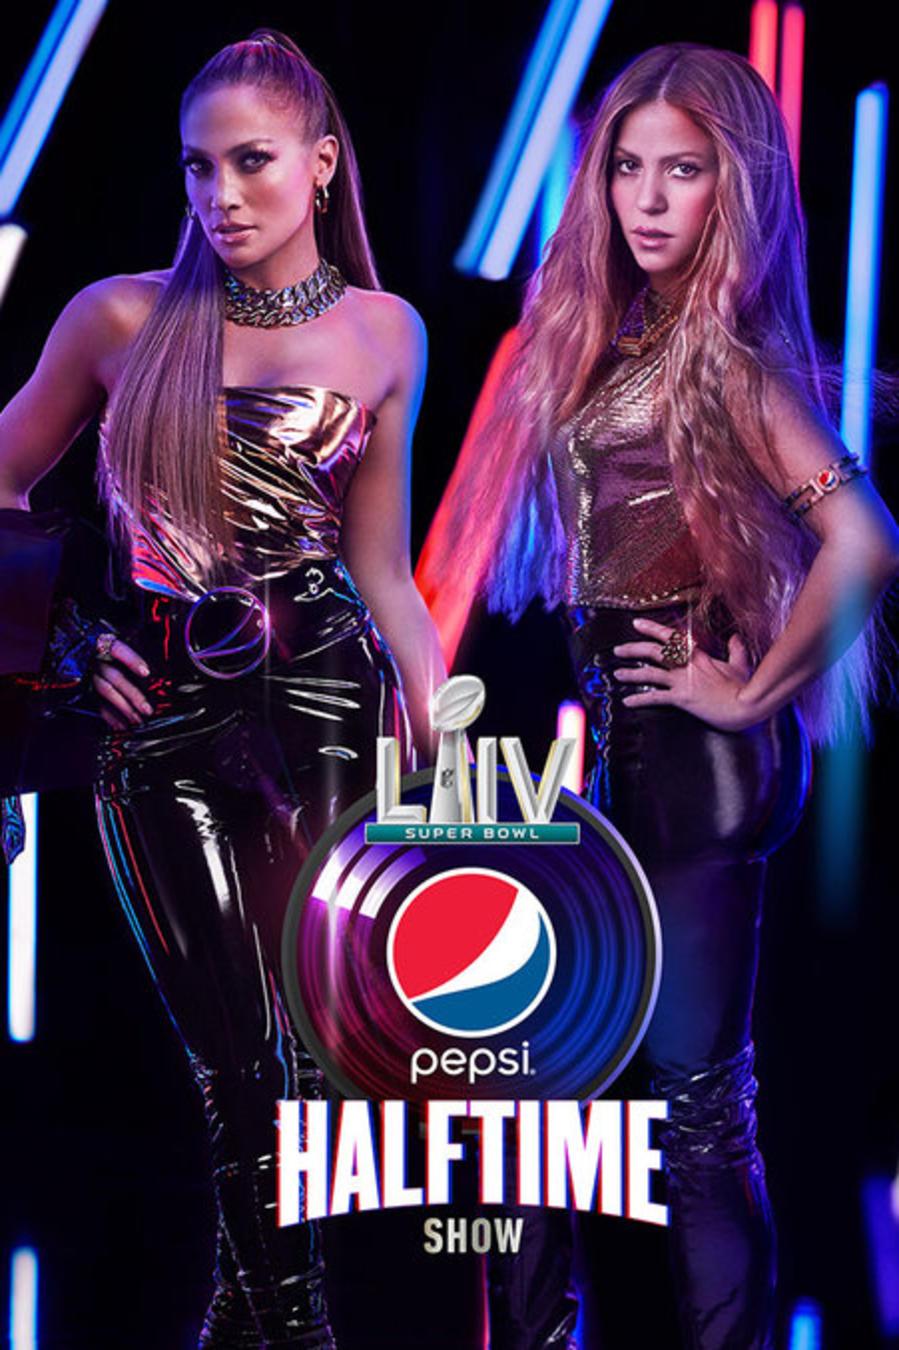 Jennifer Lopez and Shakira Super Bowl announcement